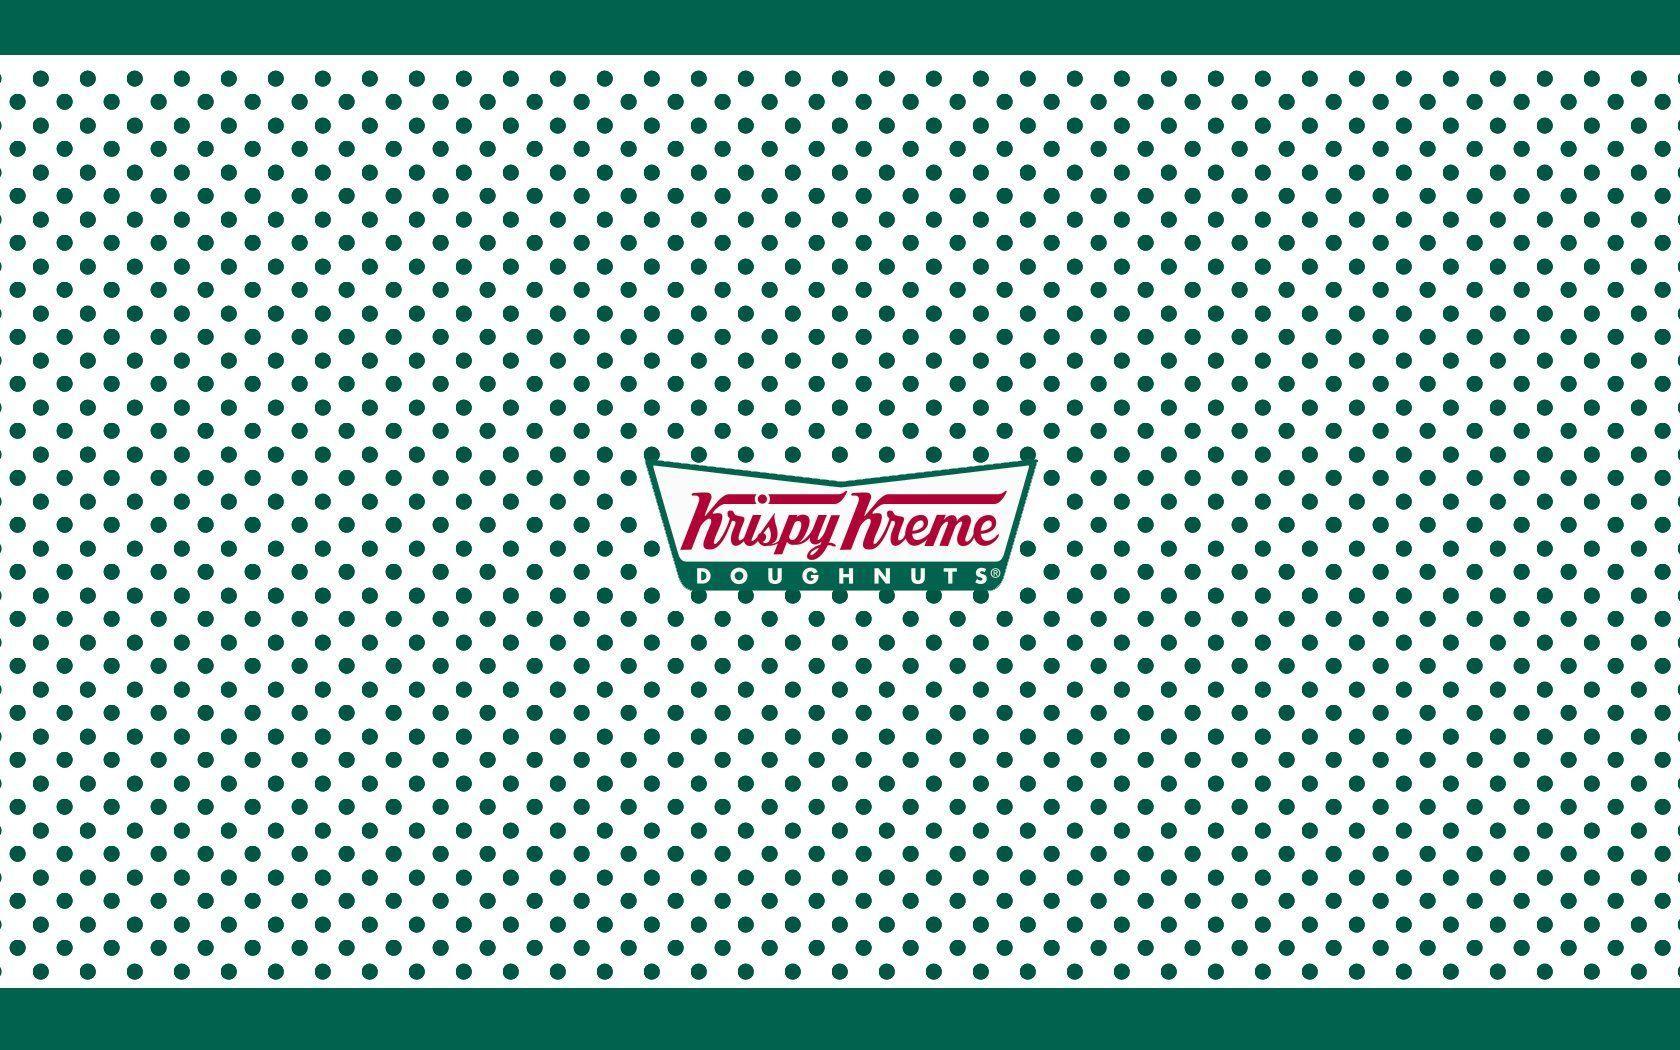 Krispy Kreme Wallpaper by Blennix on DeviantArt